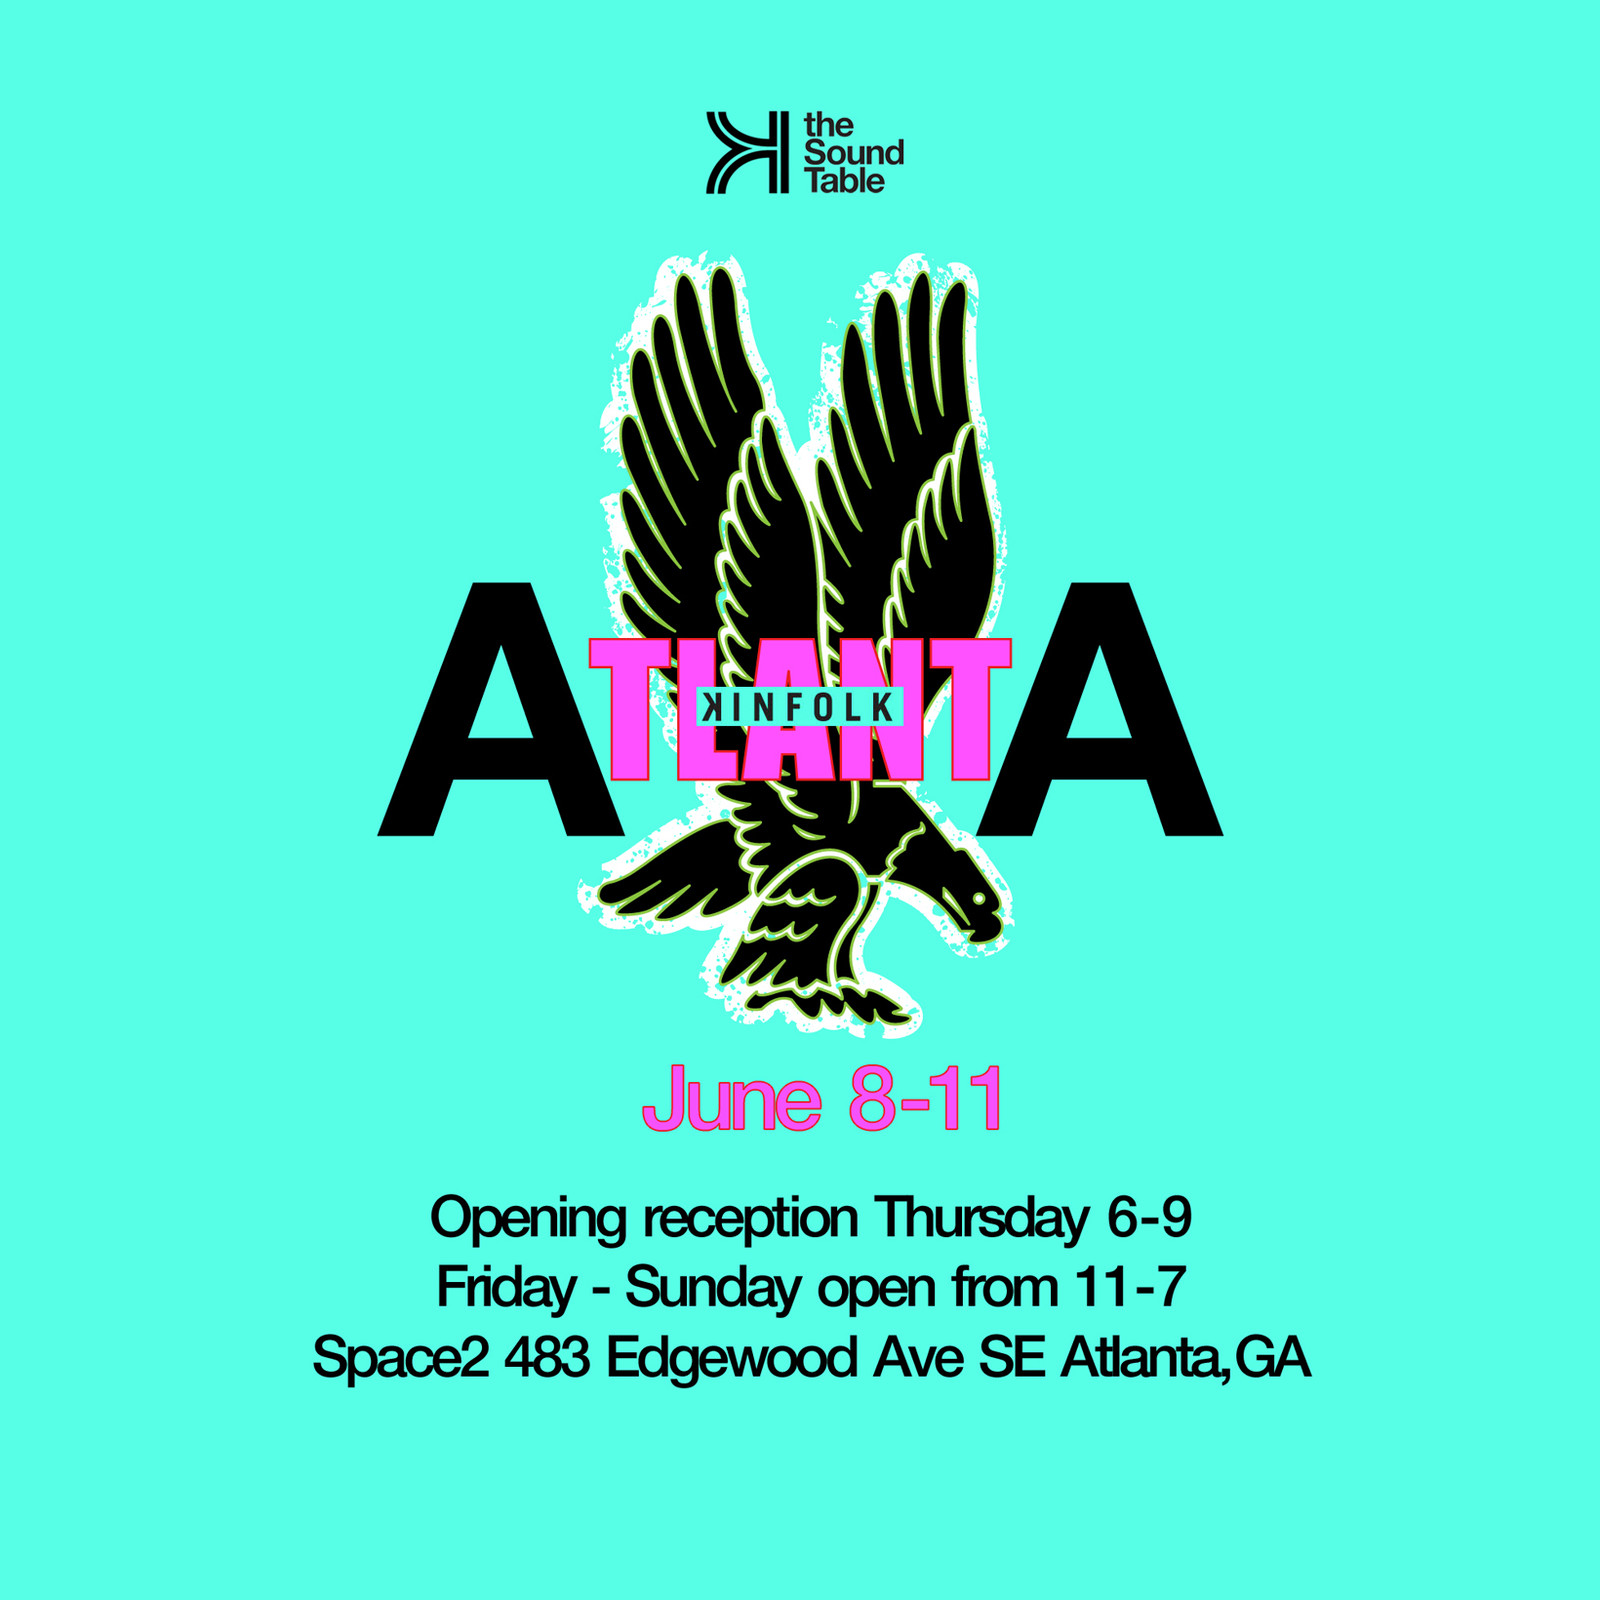 Kinfolk Atlanta Pop-Up The Sound Table Fashion Clothing Apparel Menswear Events